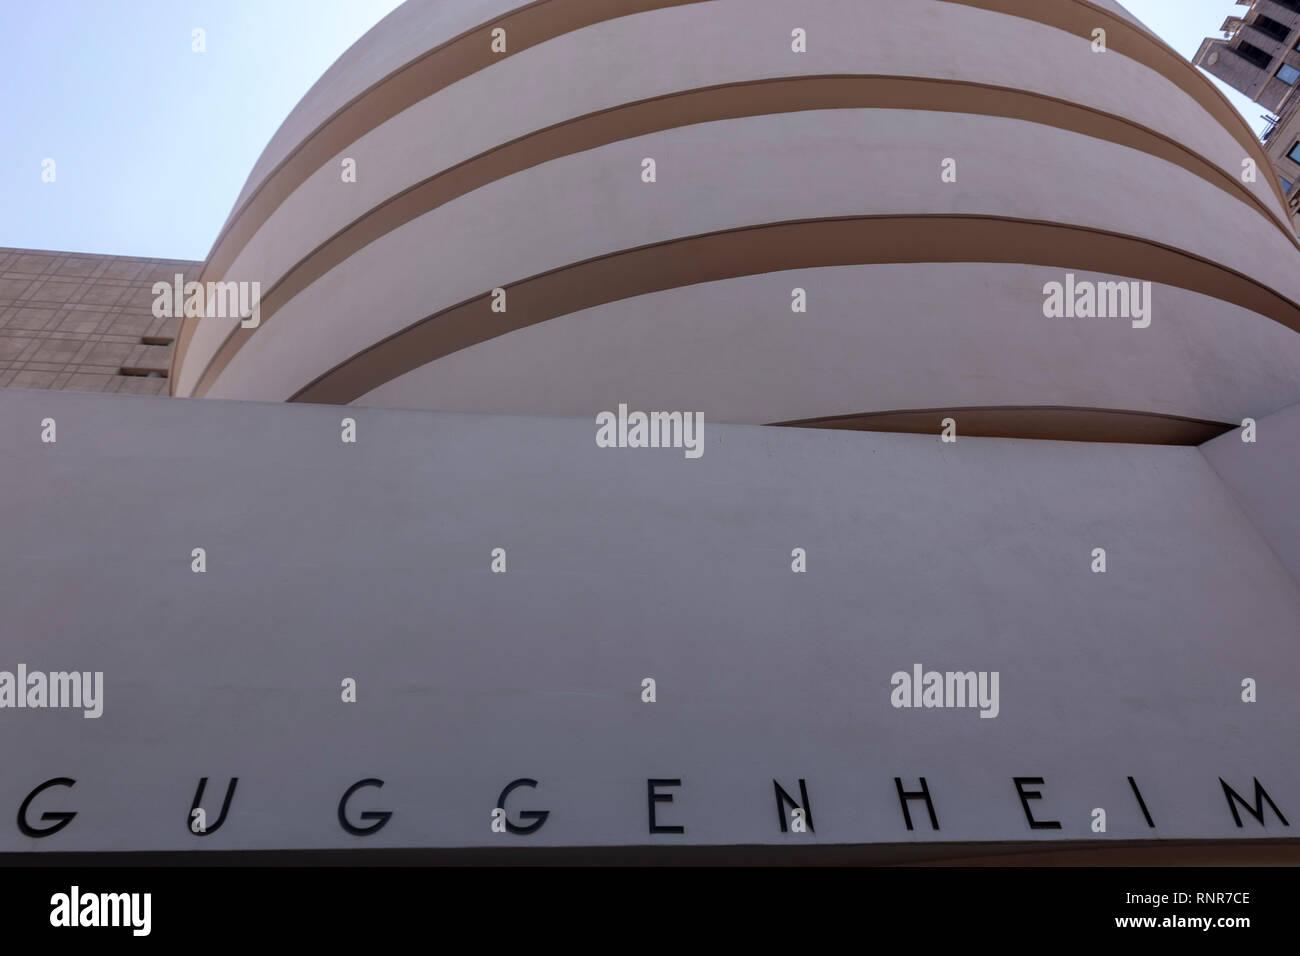 Exterior of the Solomon R. Guggenheim Museum, Frank Lloyd Wright, New York City, USA Stock Photo